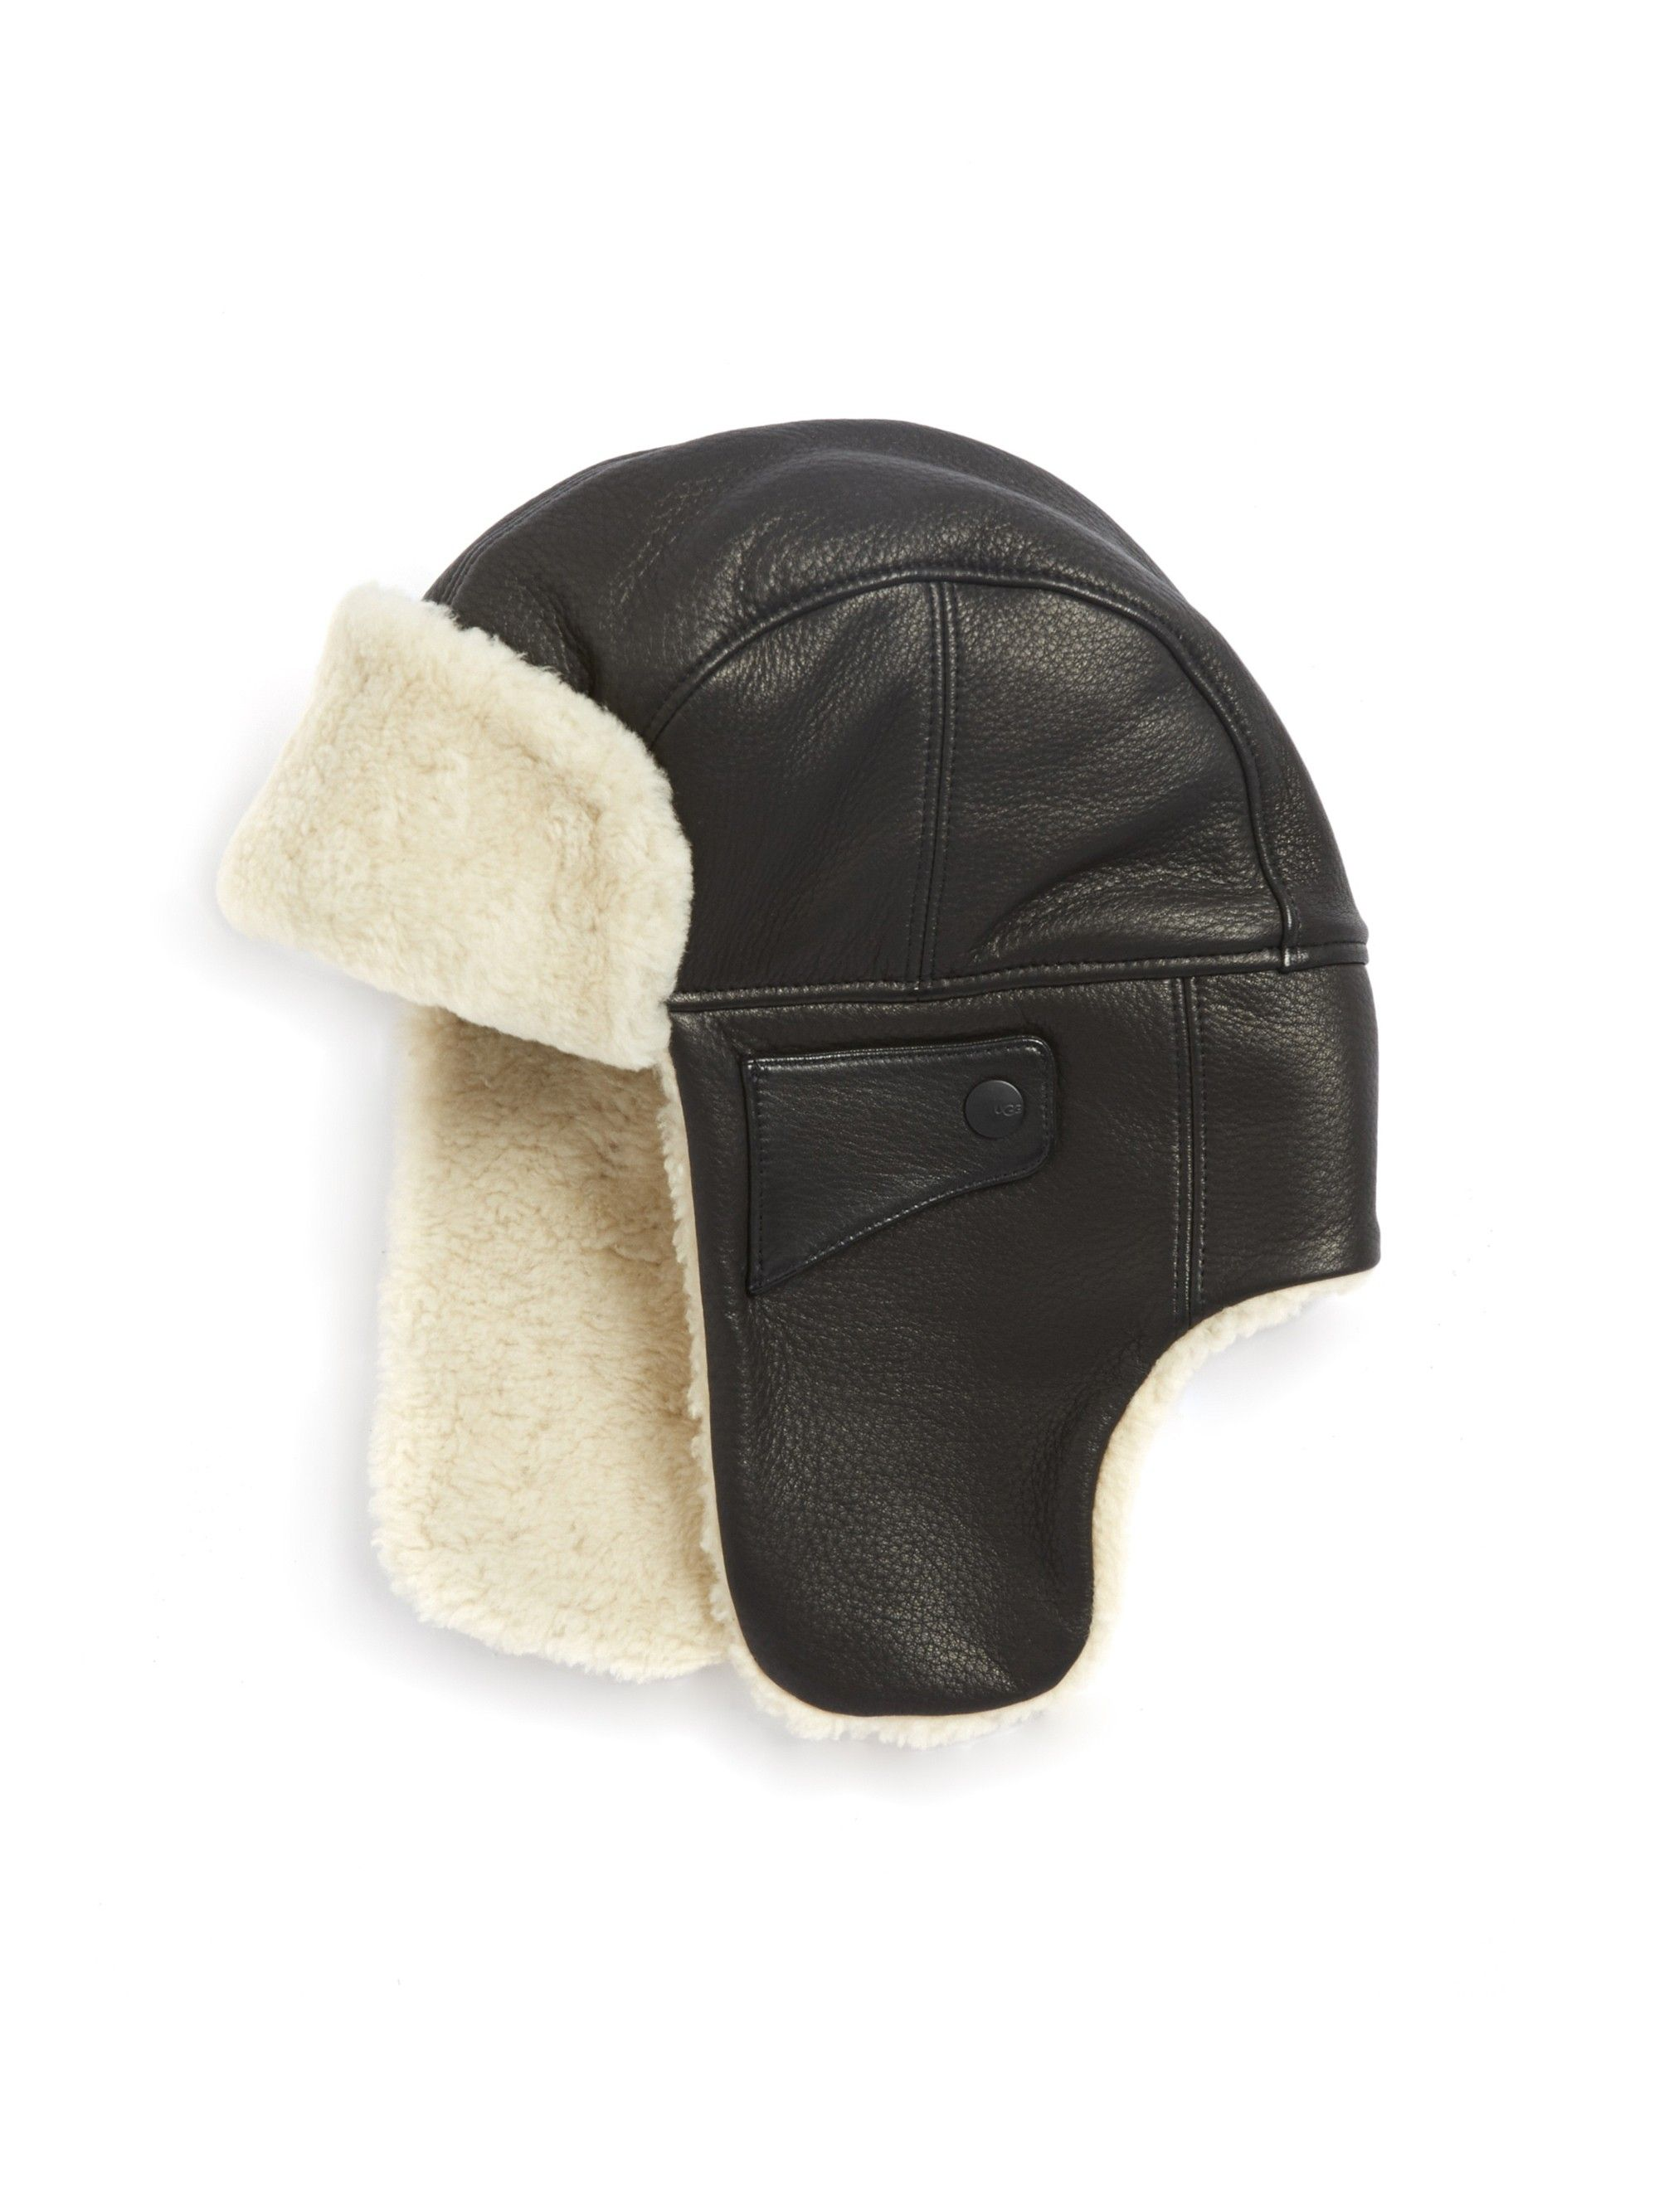 8097fbbeedb3b Ugg Australia Shearling   Leather Trapper Hat - Black Large X-Large ...